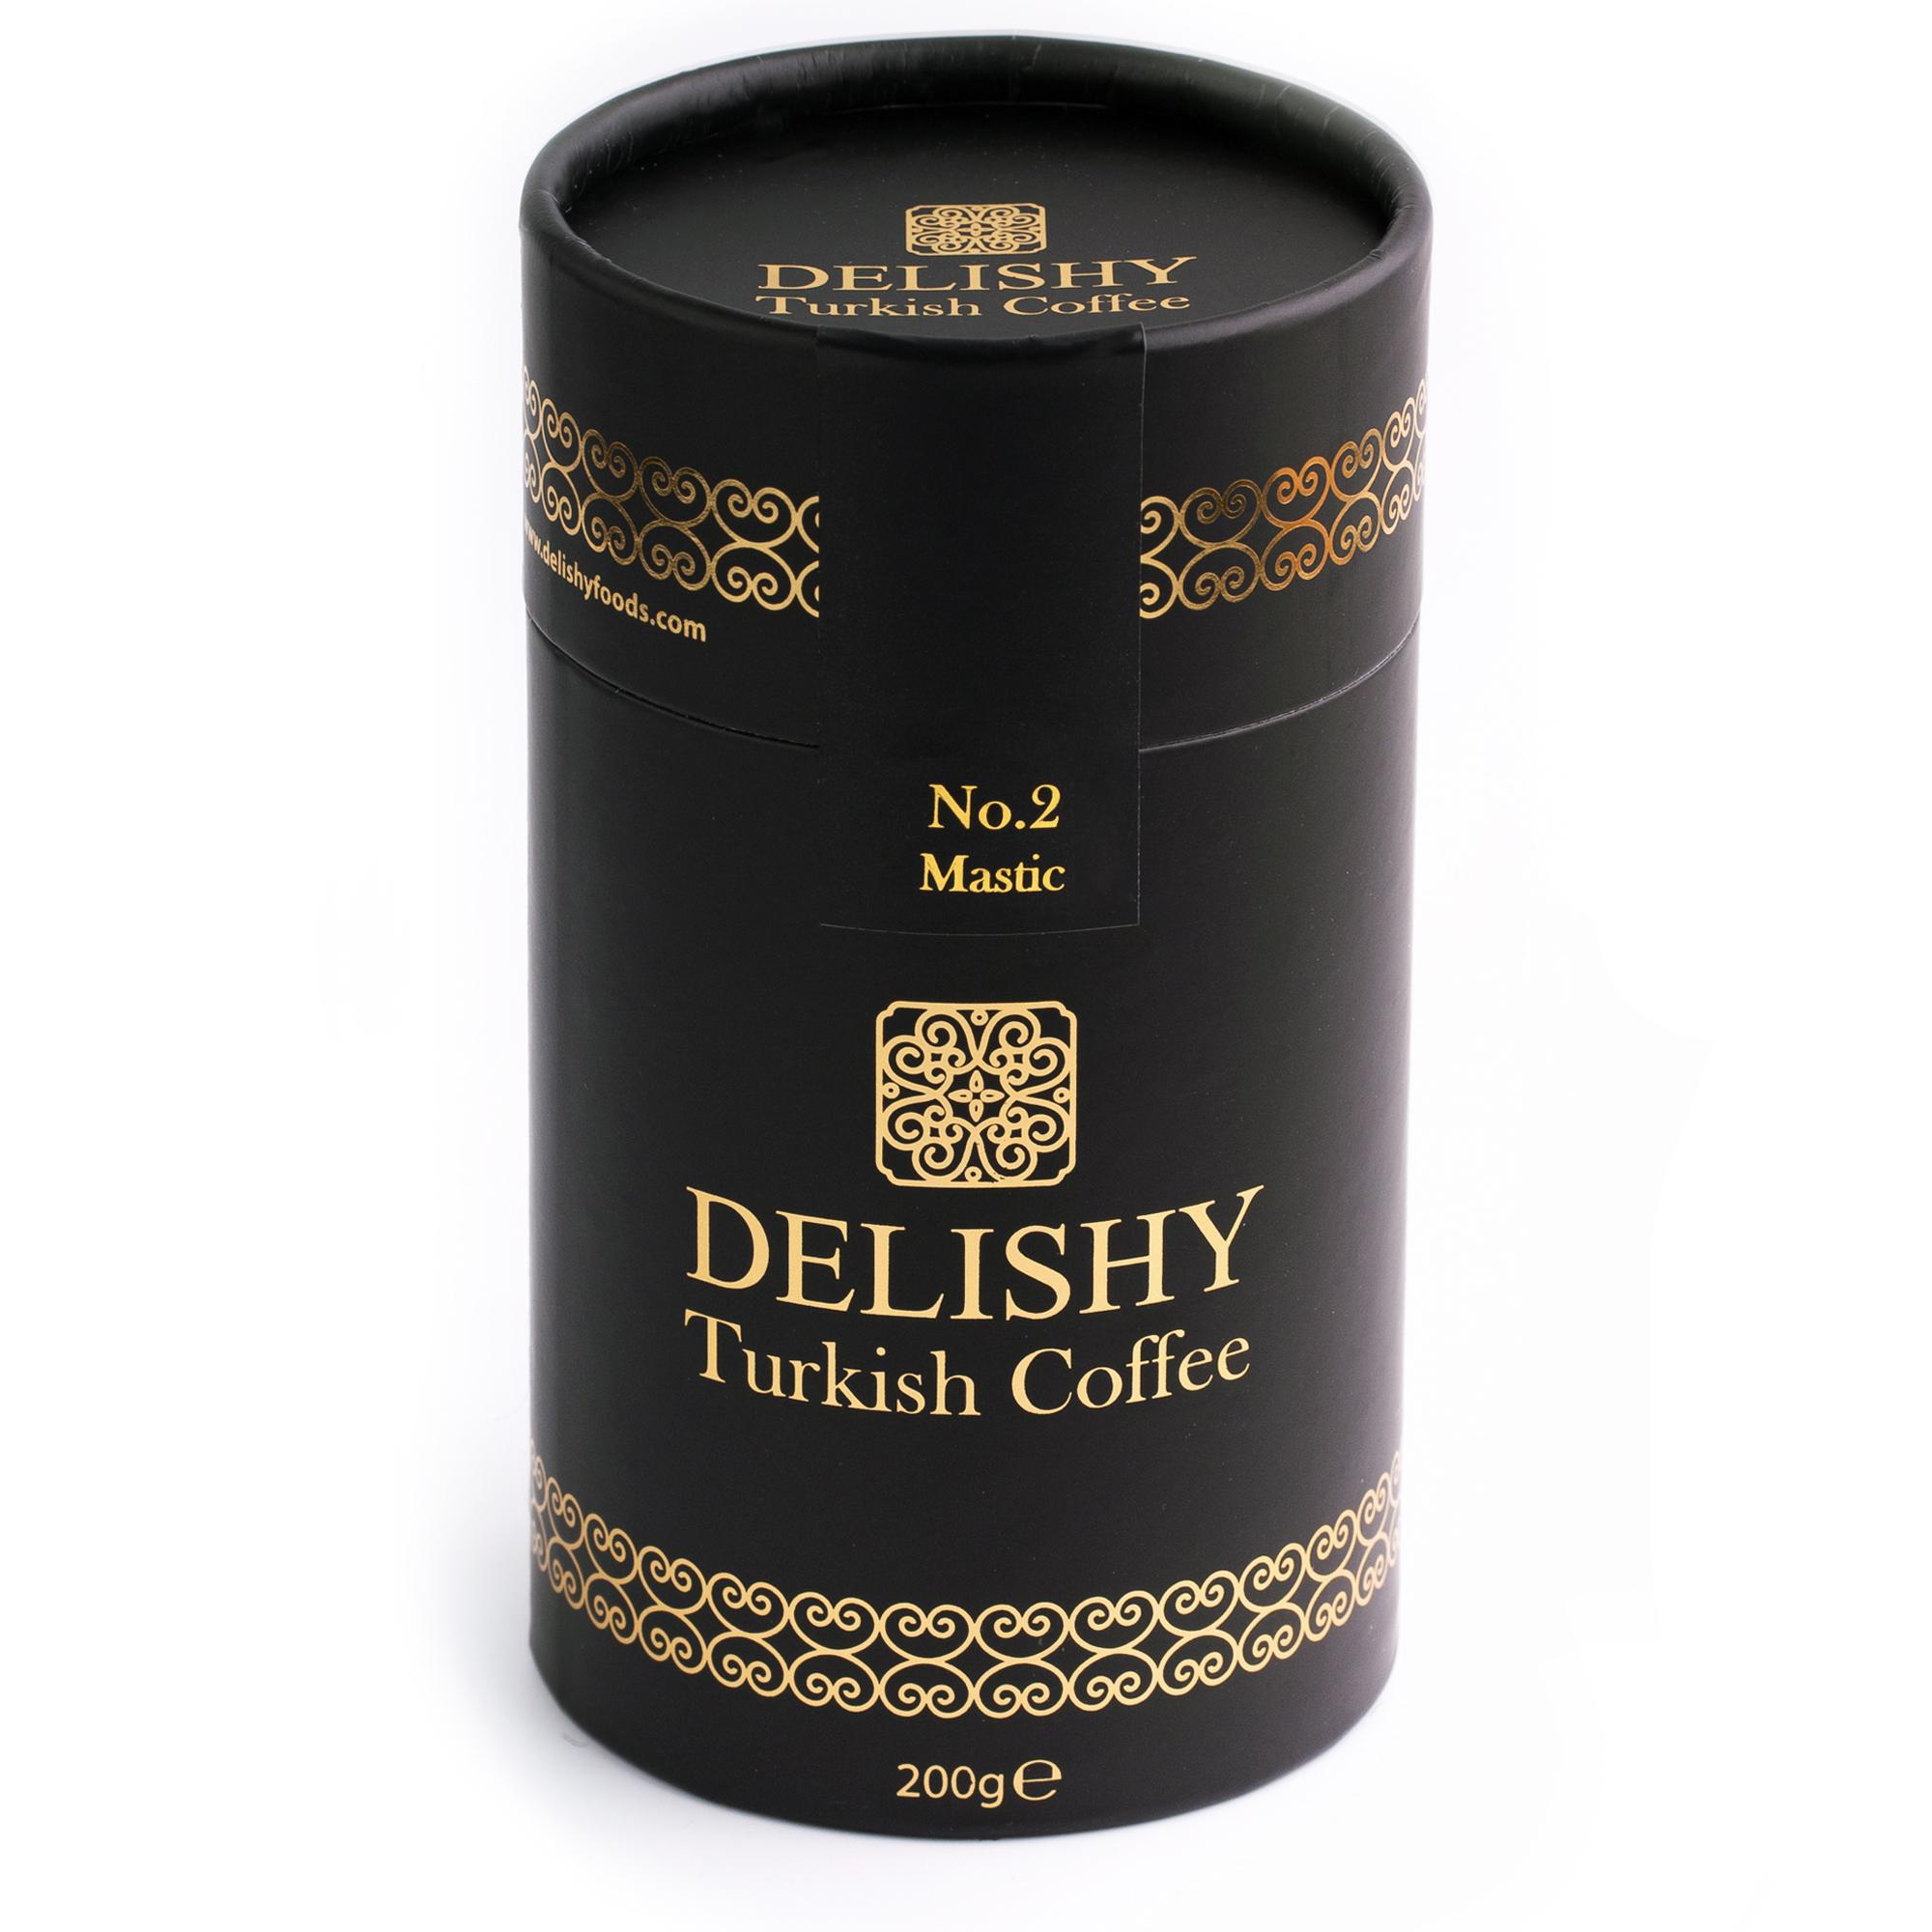 Delishy No.2 Mastic Turkish Coffee (200g)